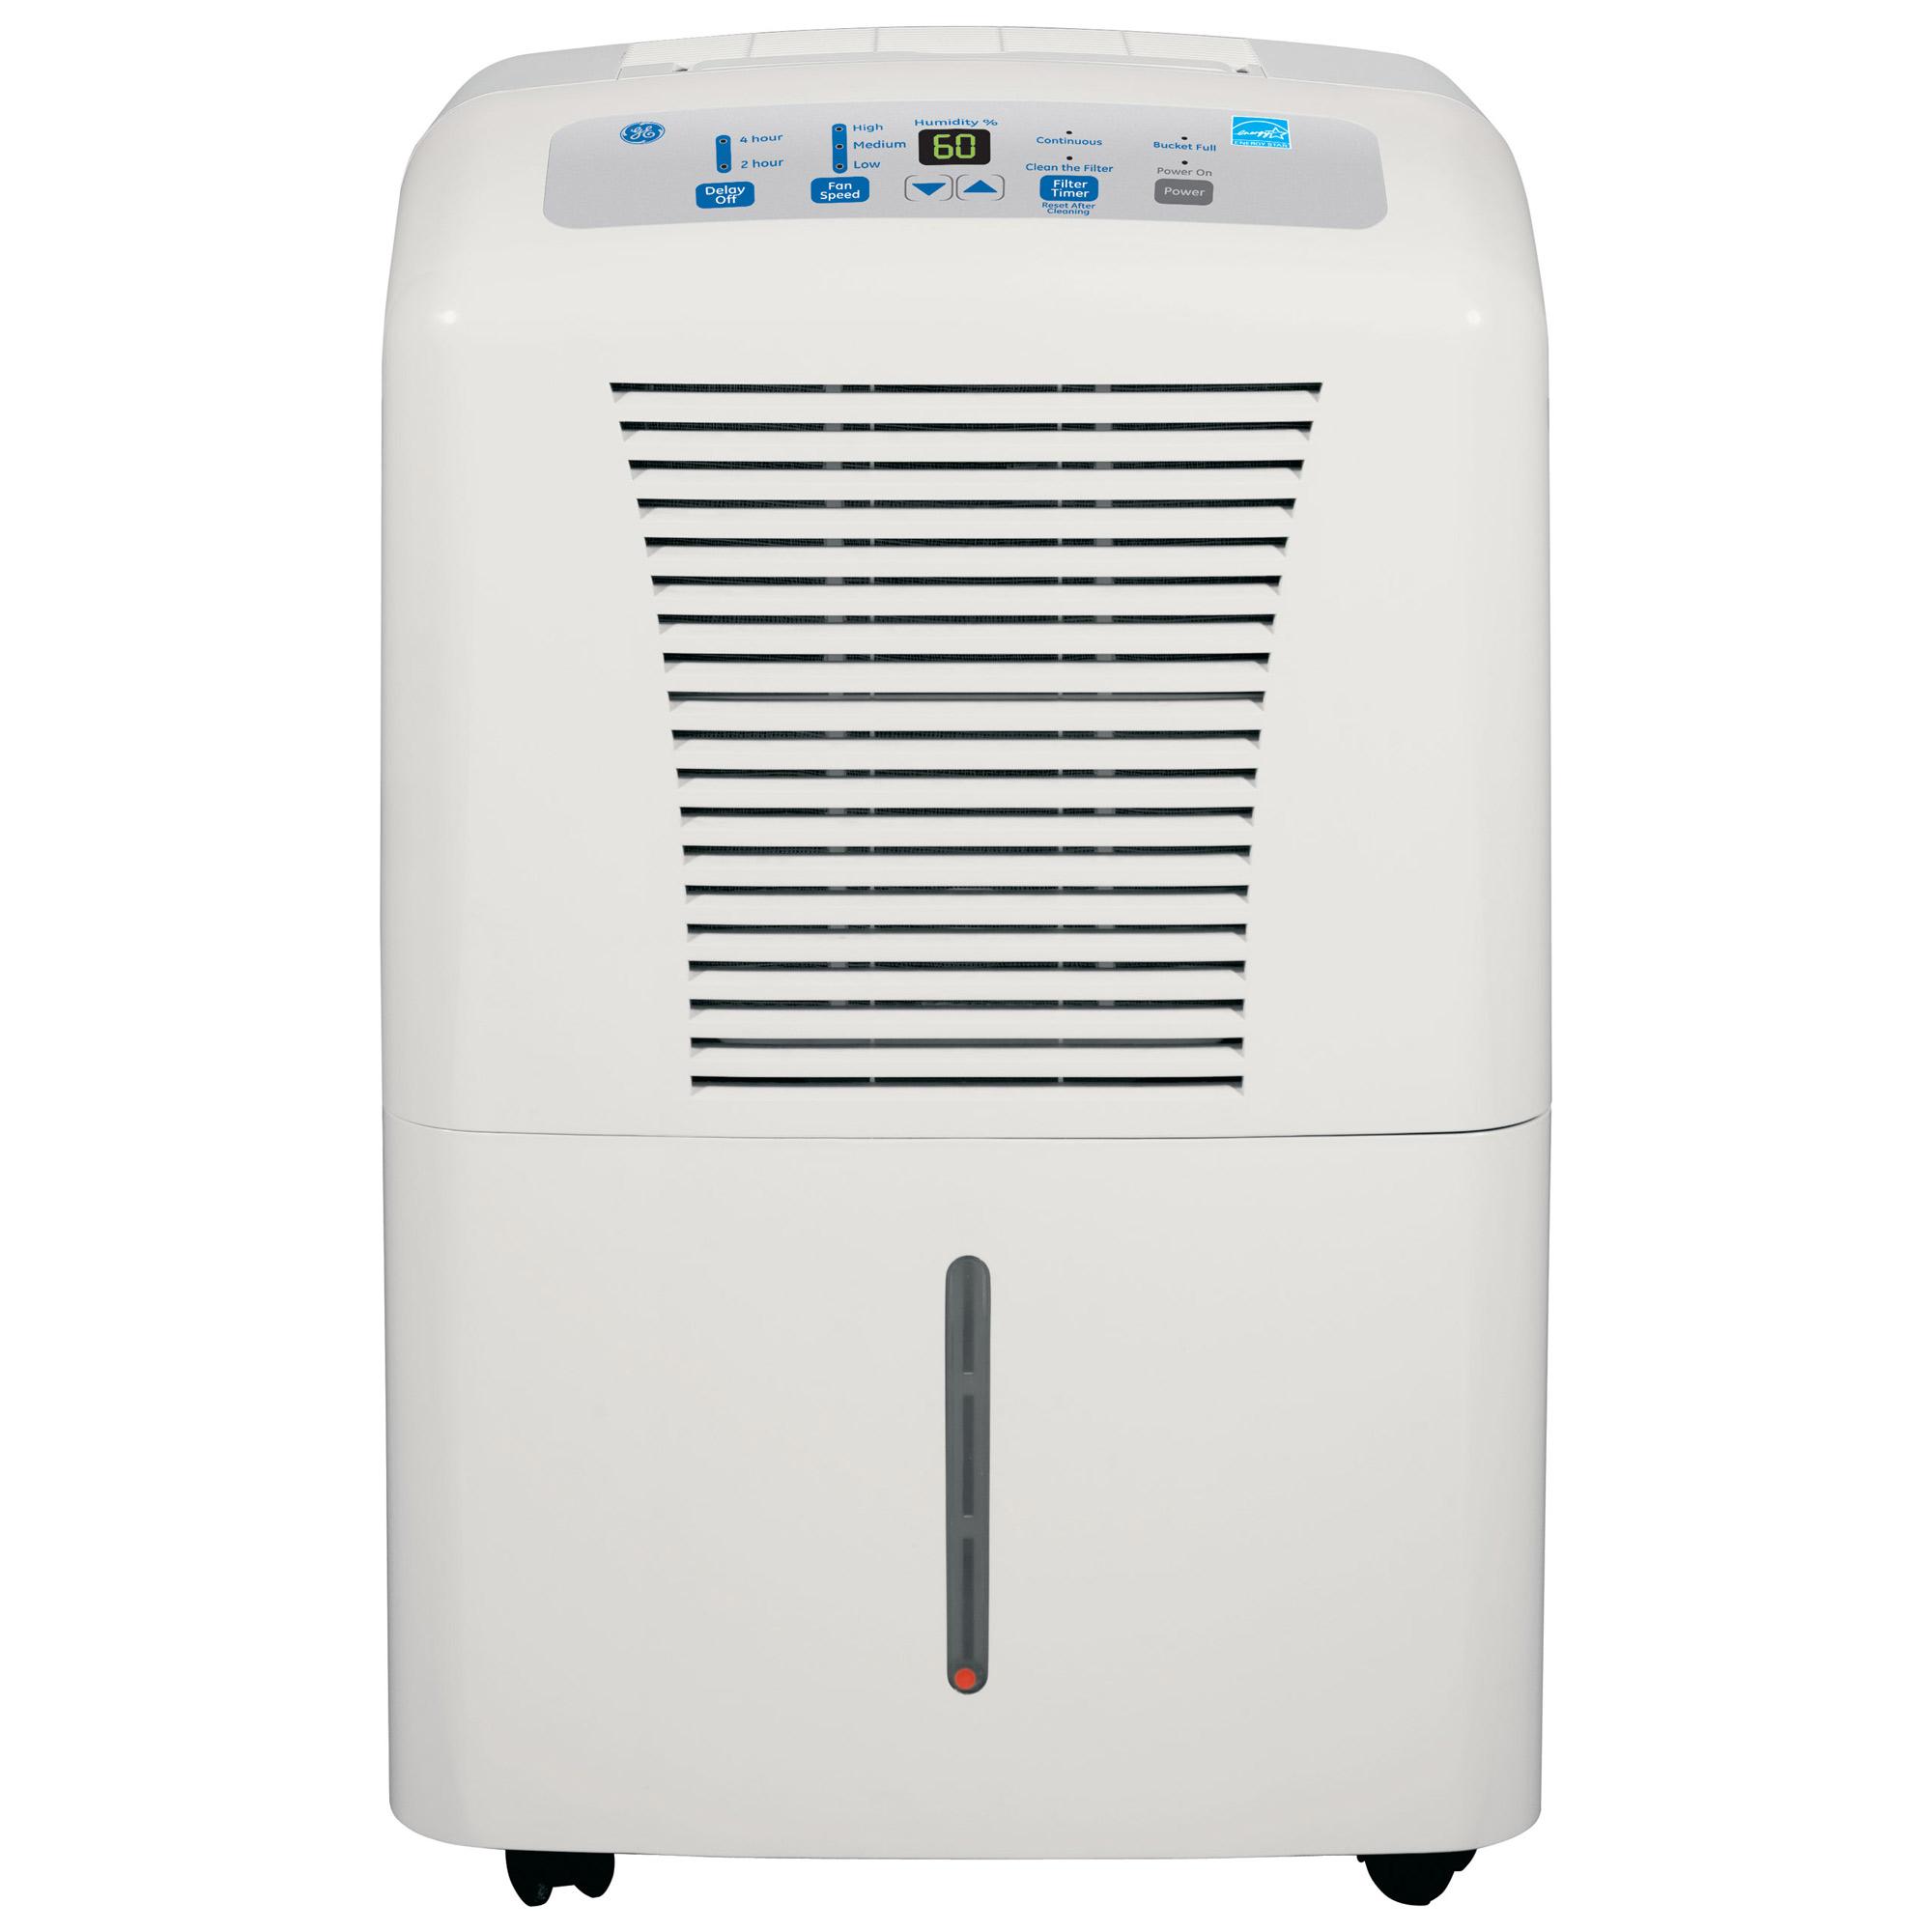 Walmart Dehumidifier Filters ge 70-pint dehumidifier for basements w/drain, white, adew70lr